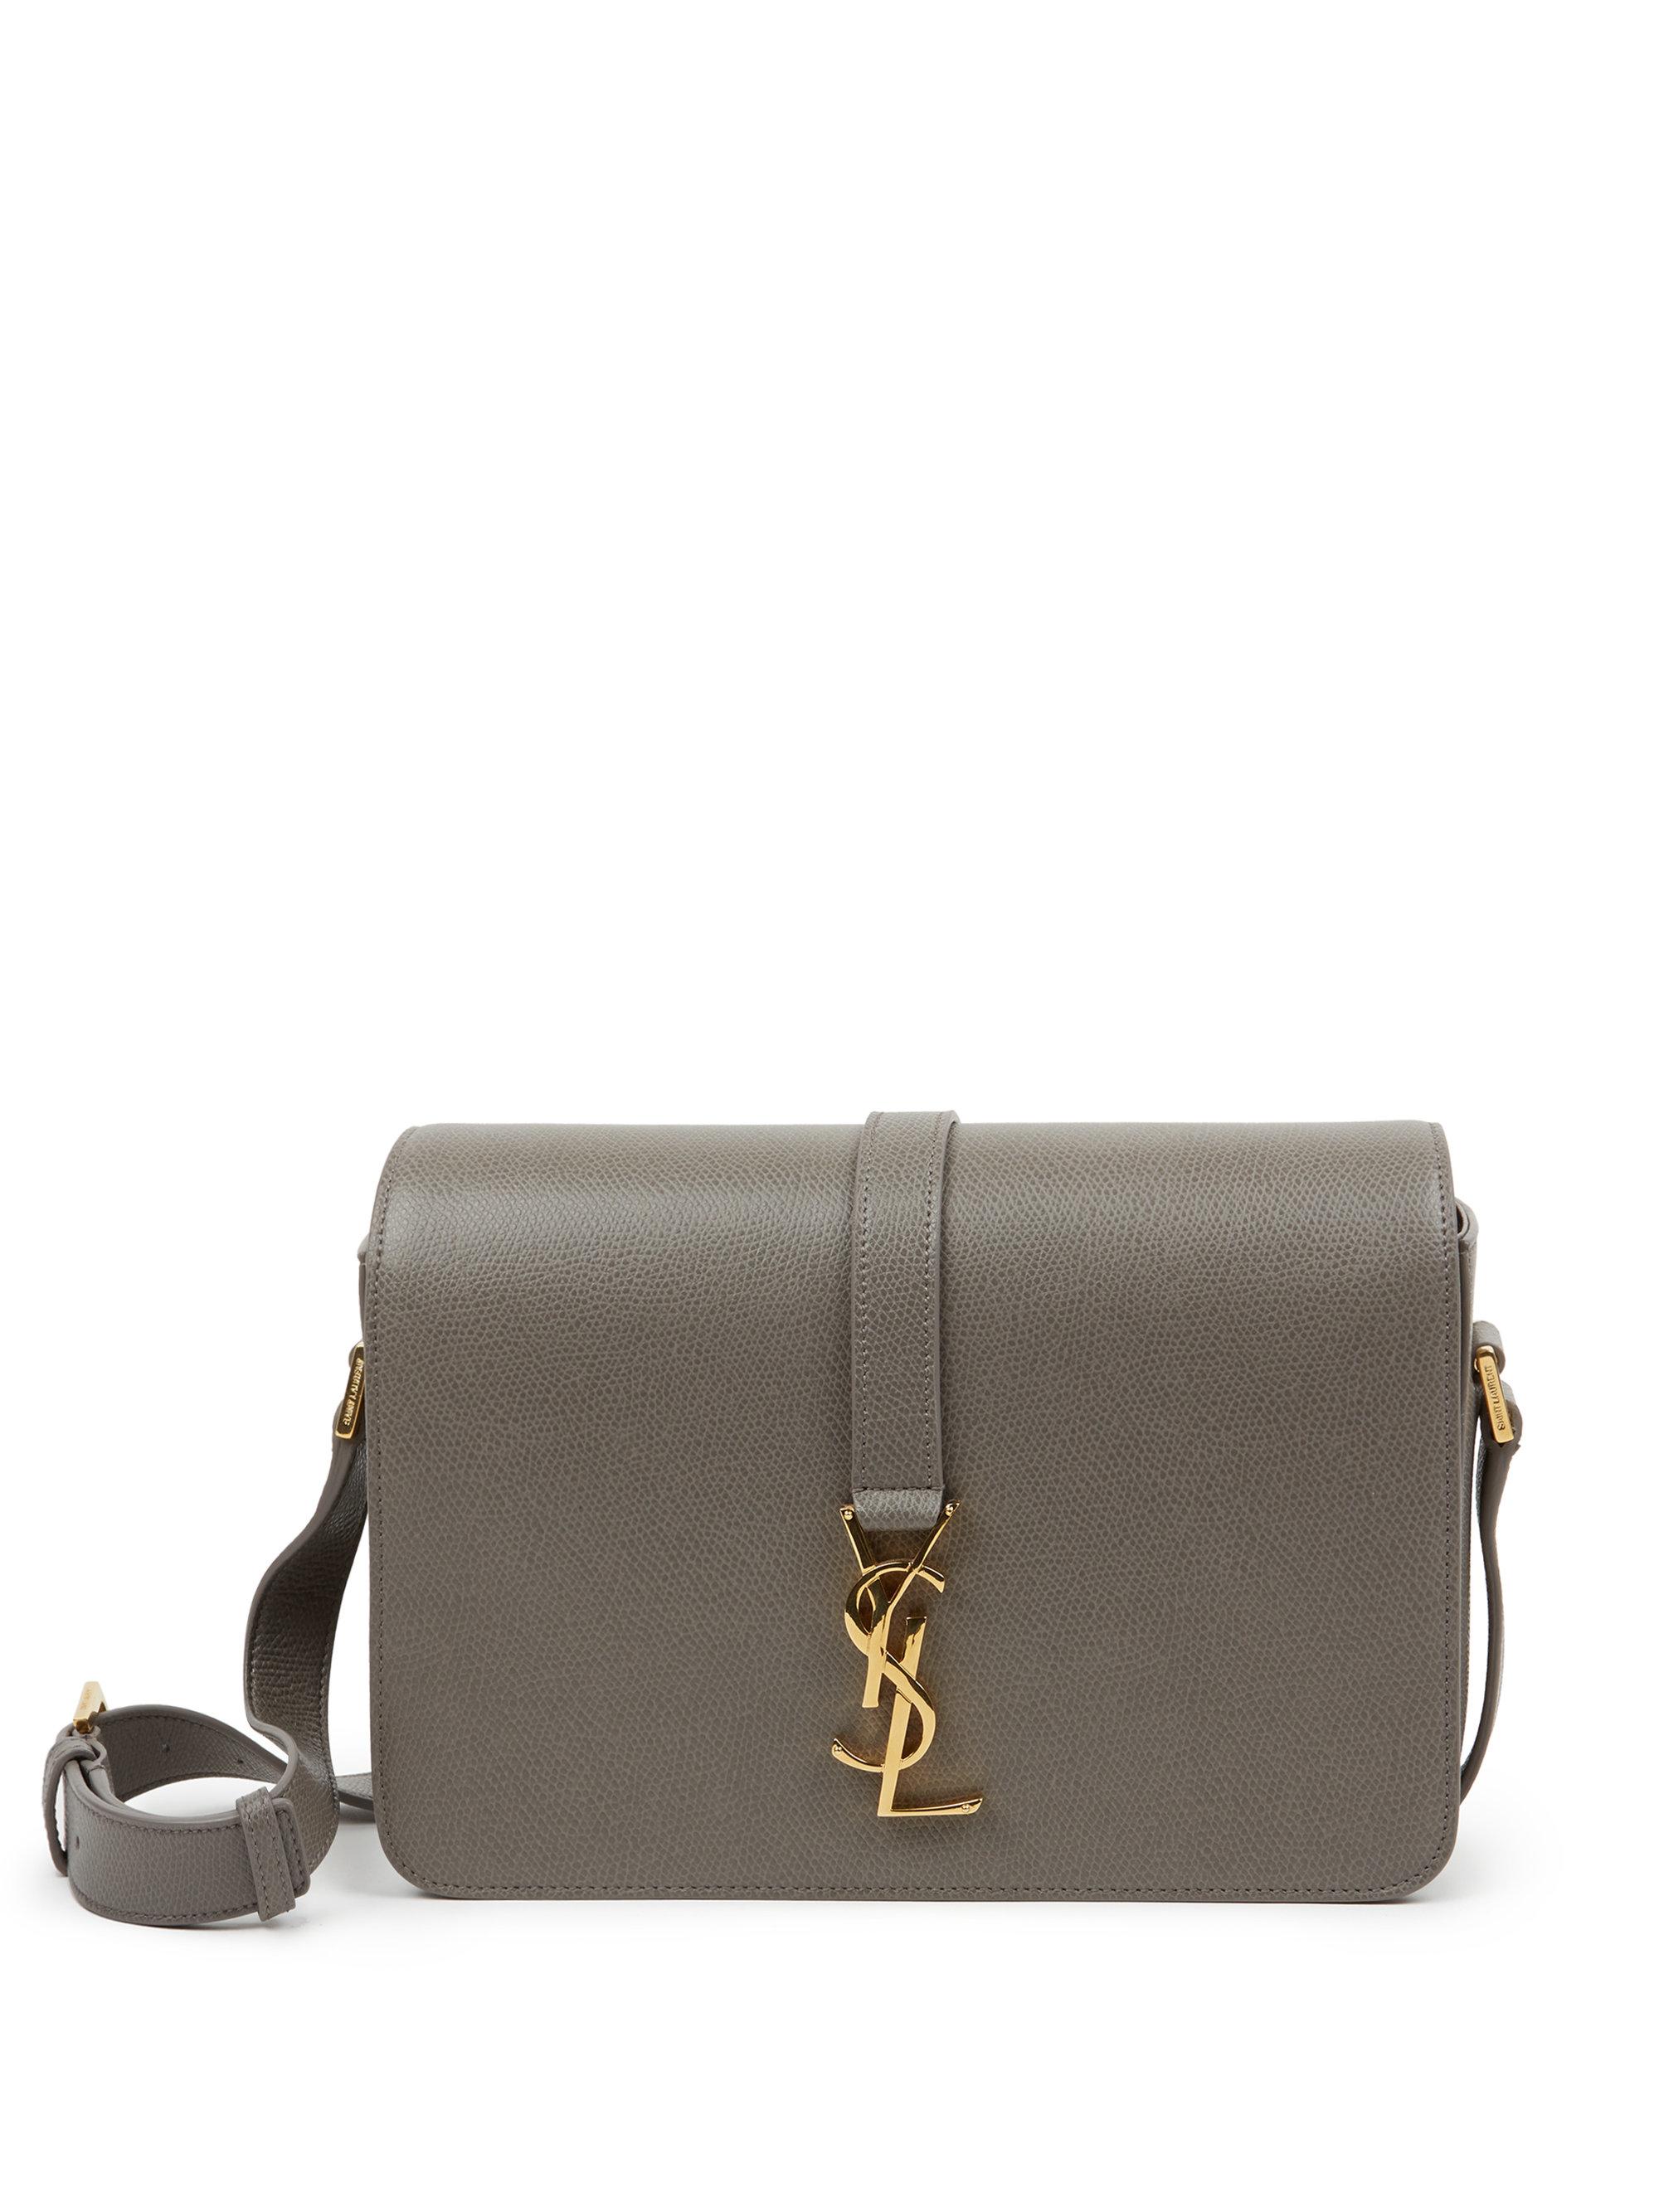 Saint laurent Monogram Universite Medium Textured Leather ... monogram  small universite satchel bag ... b94b1a7cfba4a